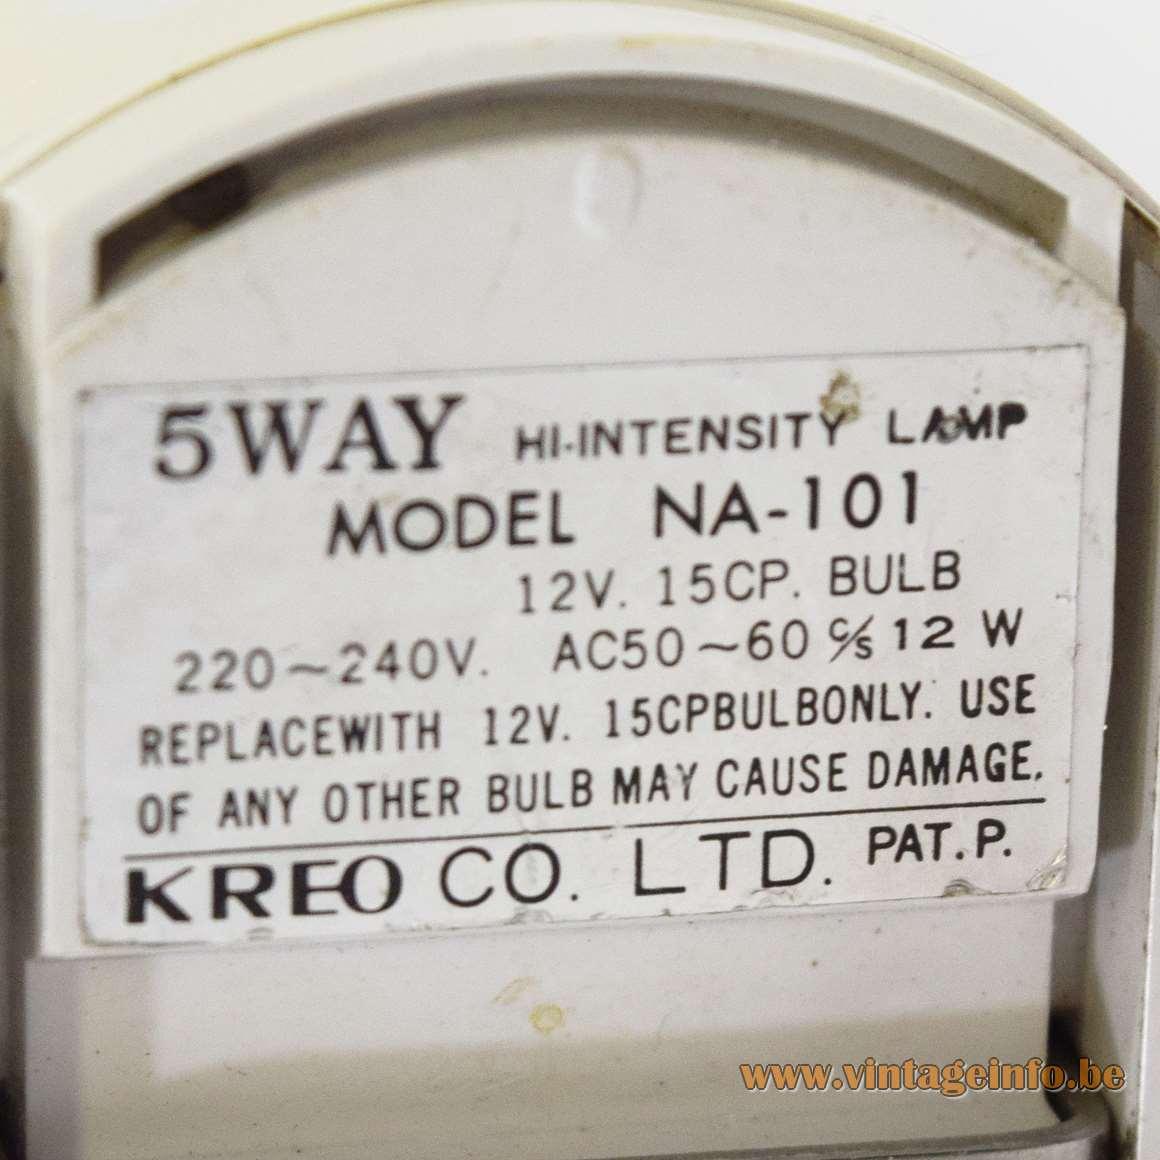 Kreo Folding Bedside lamp - Label NA-101